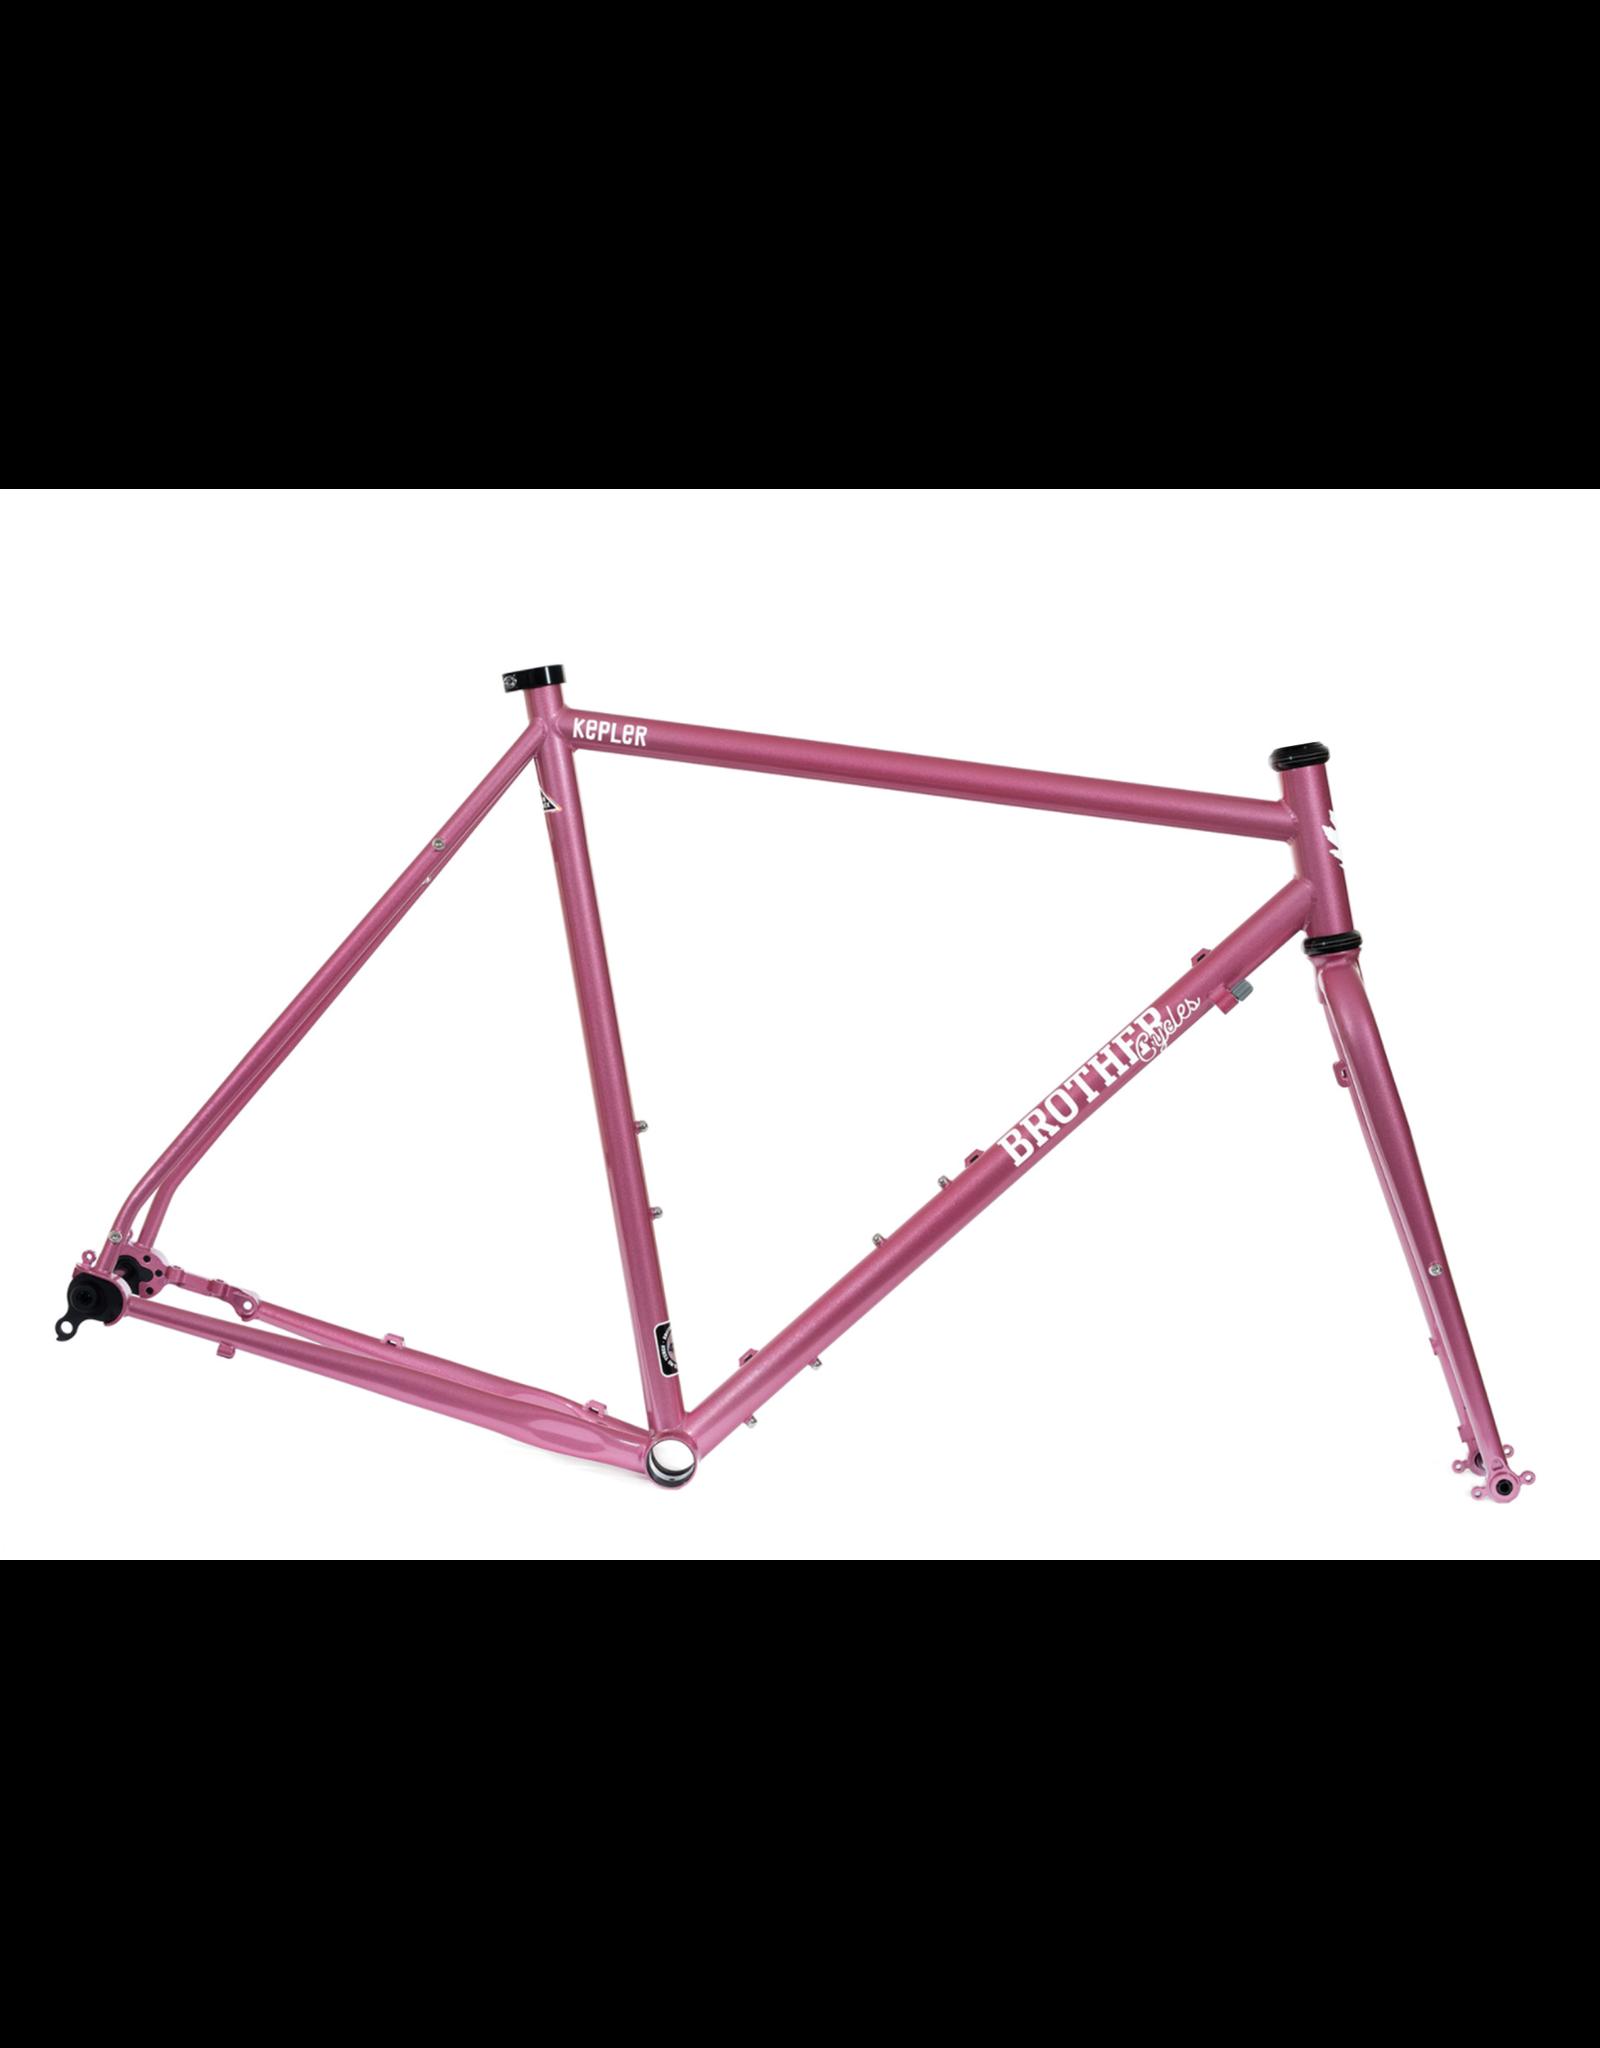 Brother Cycles Kepler 2021 Pink Metallic